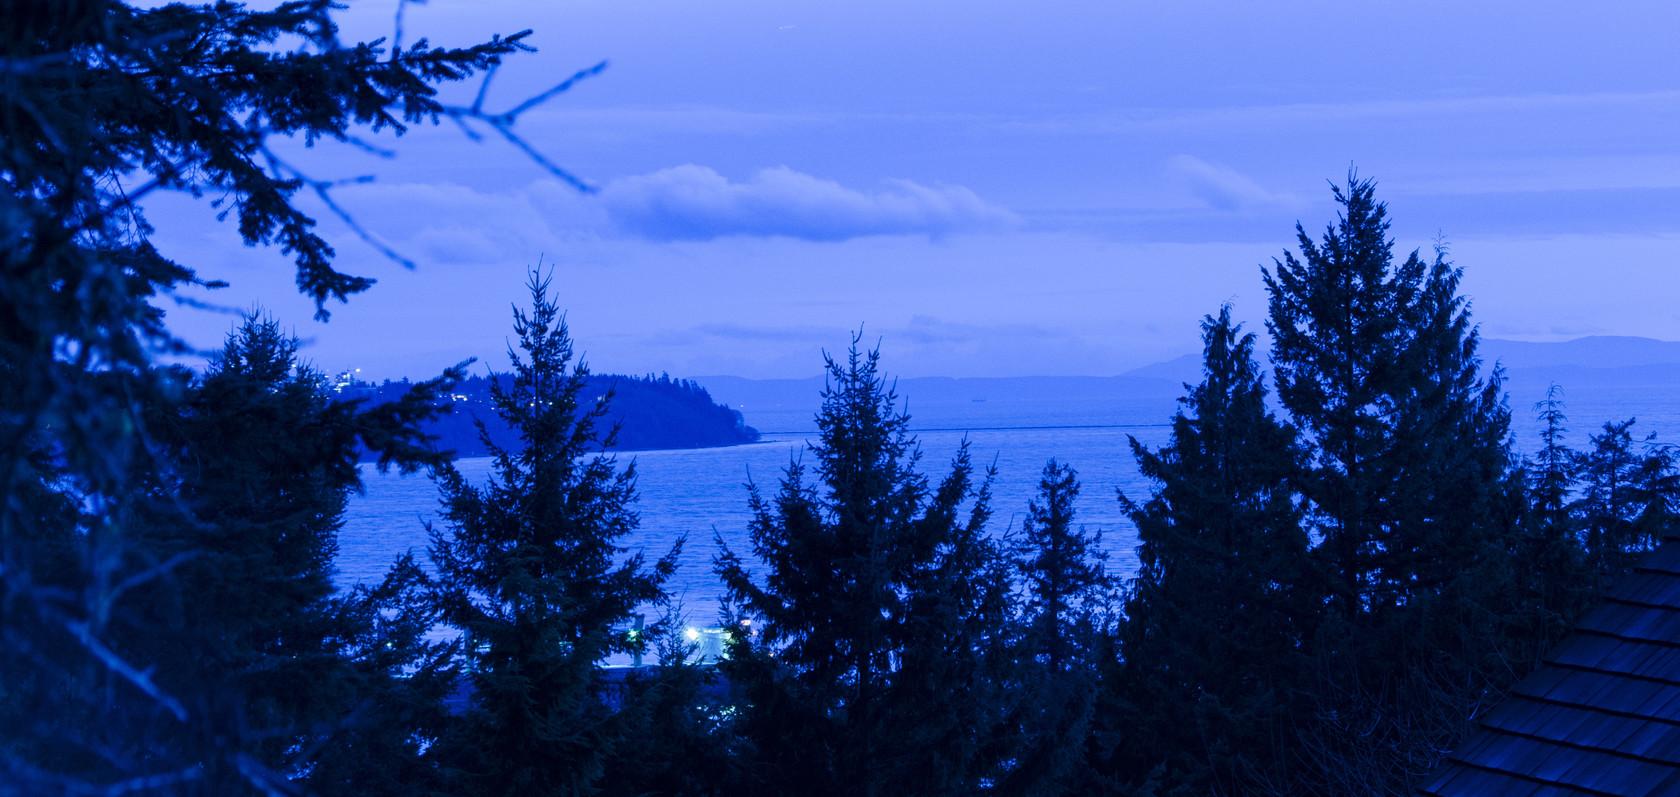 002 at 4660 Willow Creek Road, Rockridge, West Vancouver